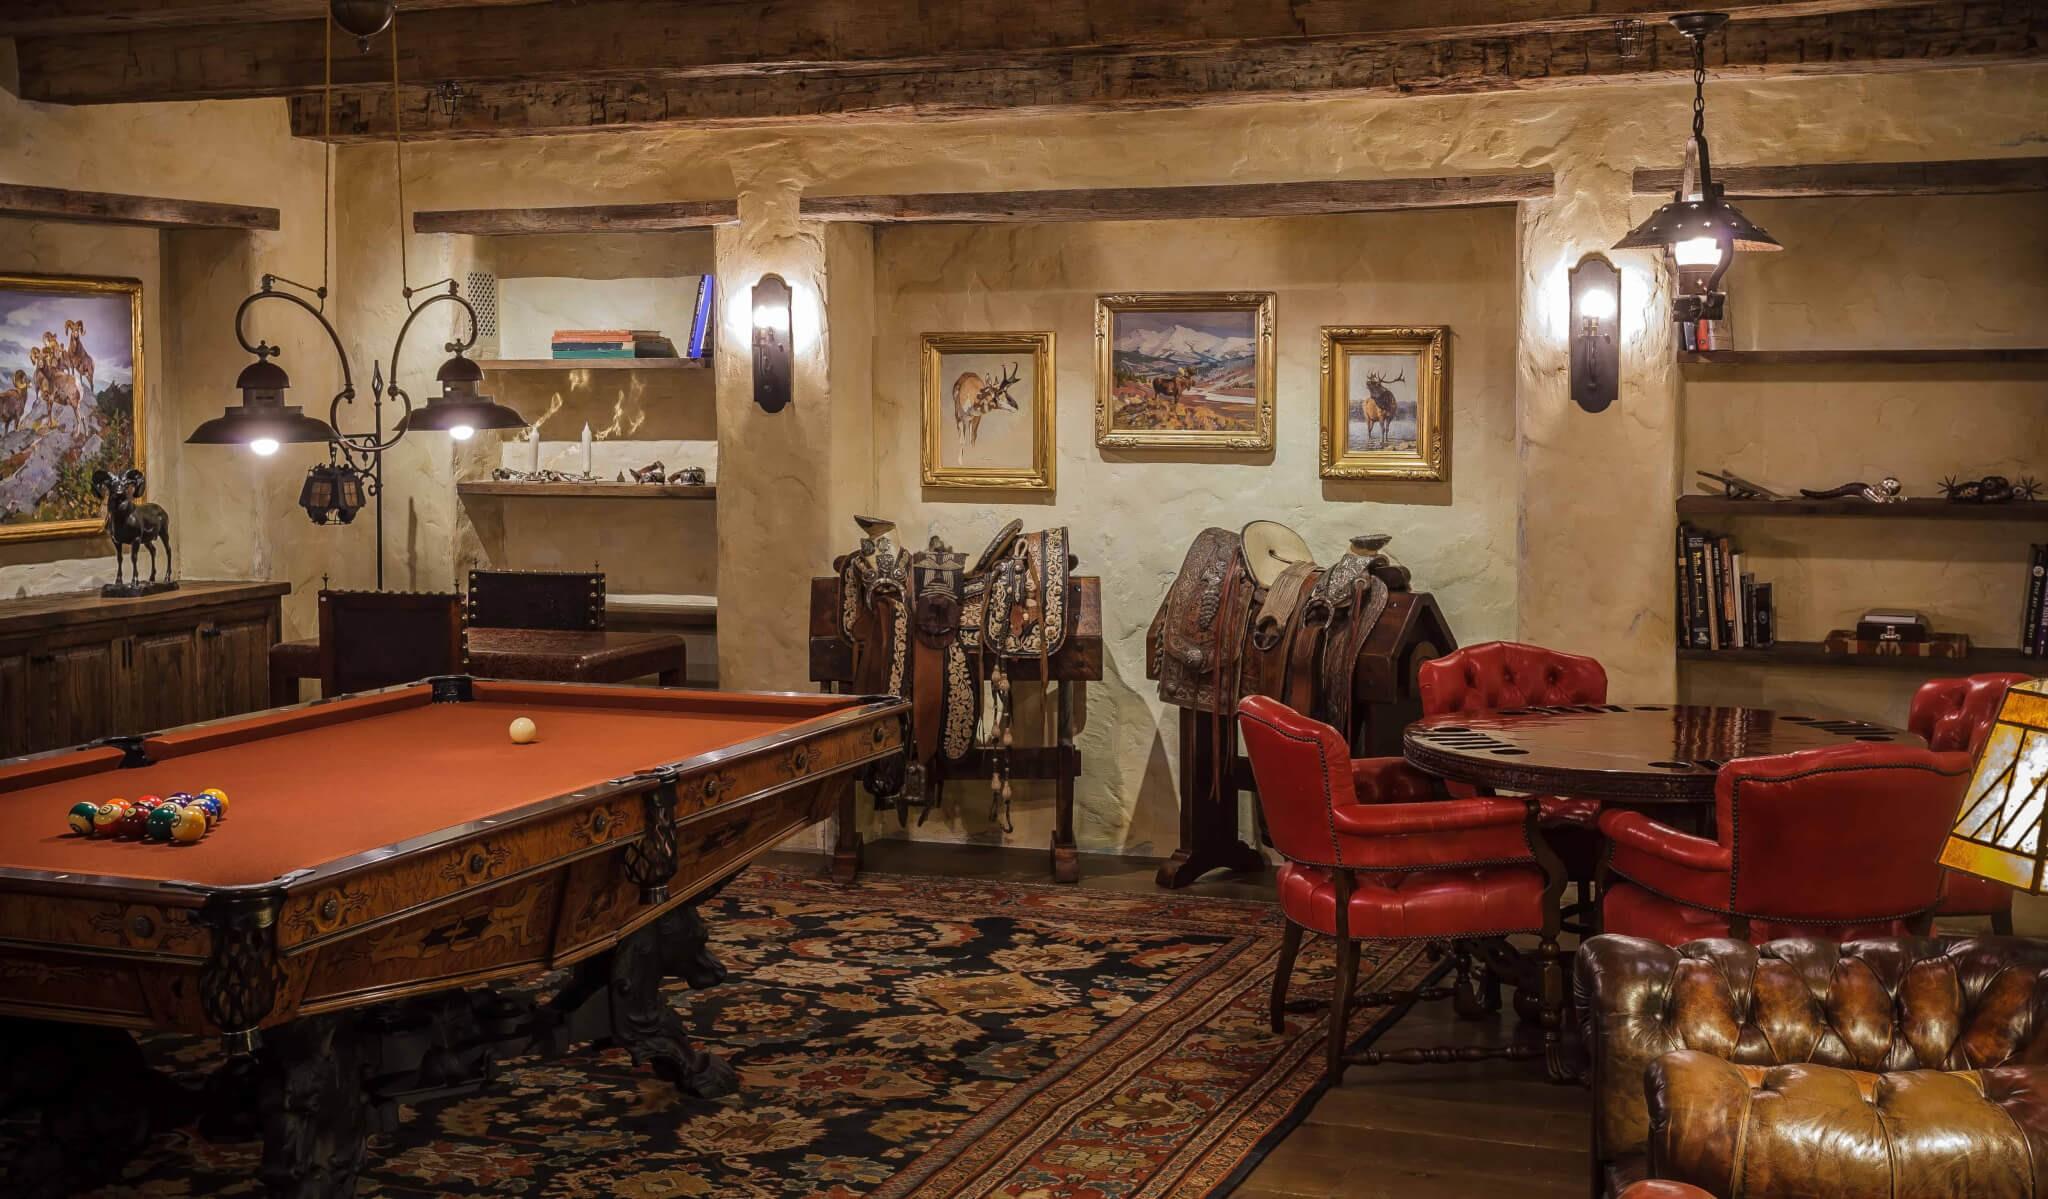 Willow Creek, million-dollar ranch